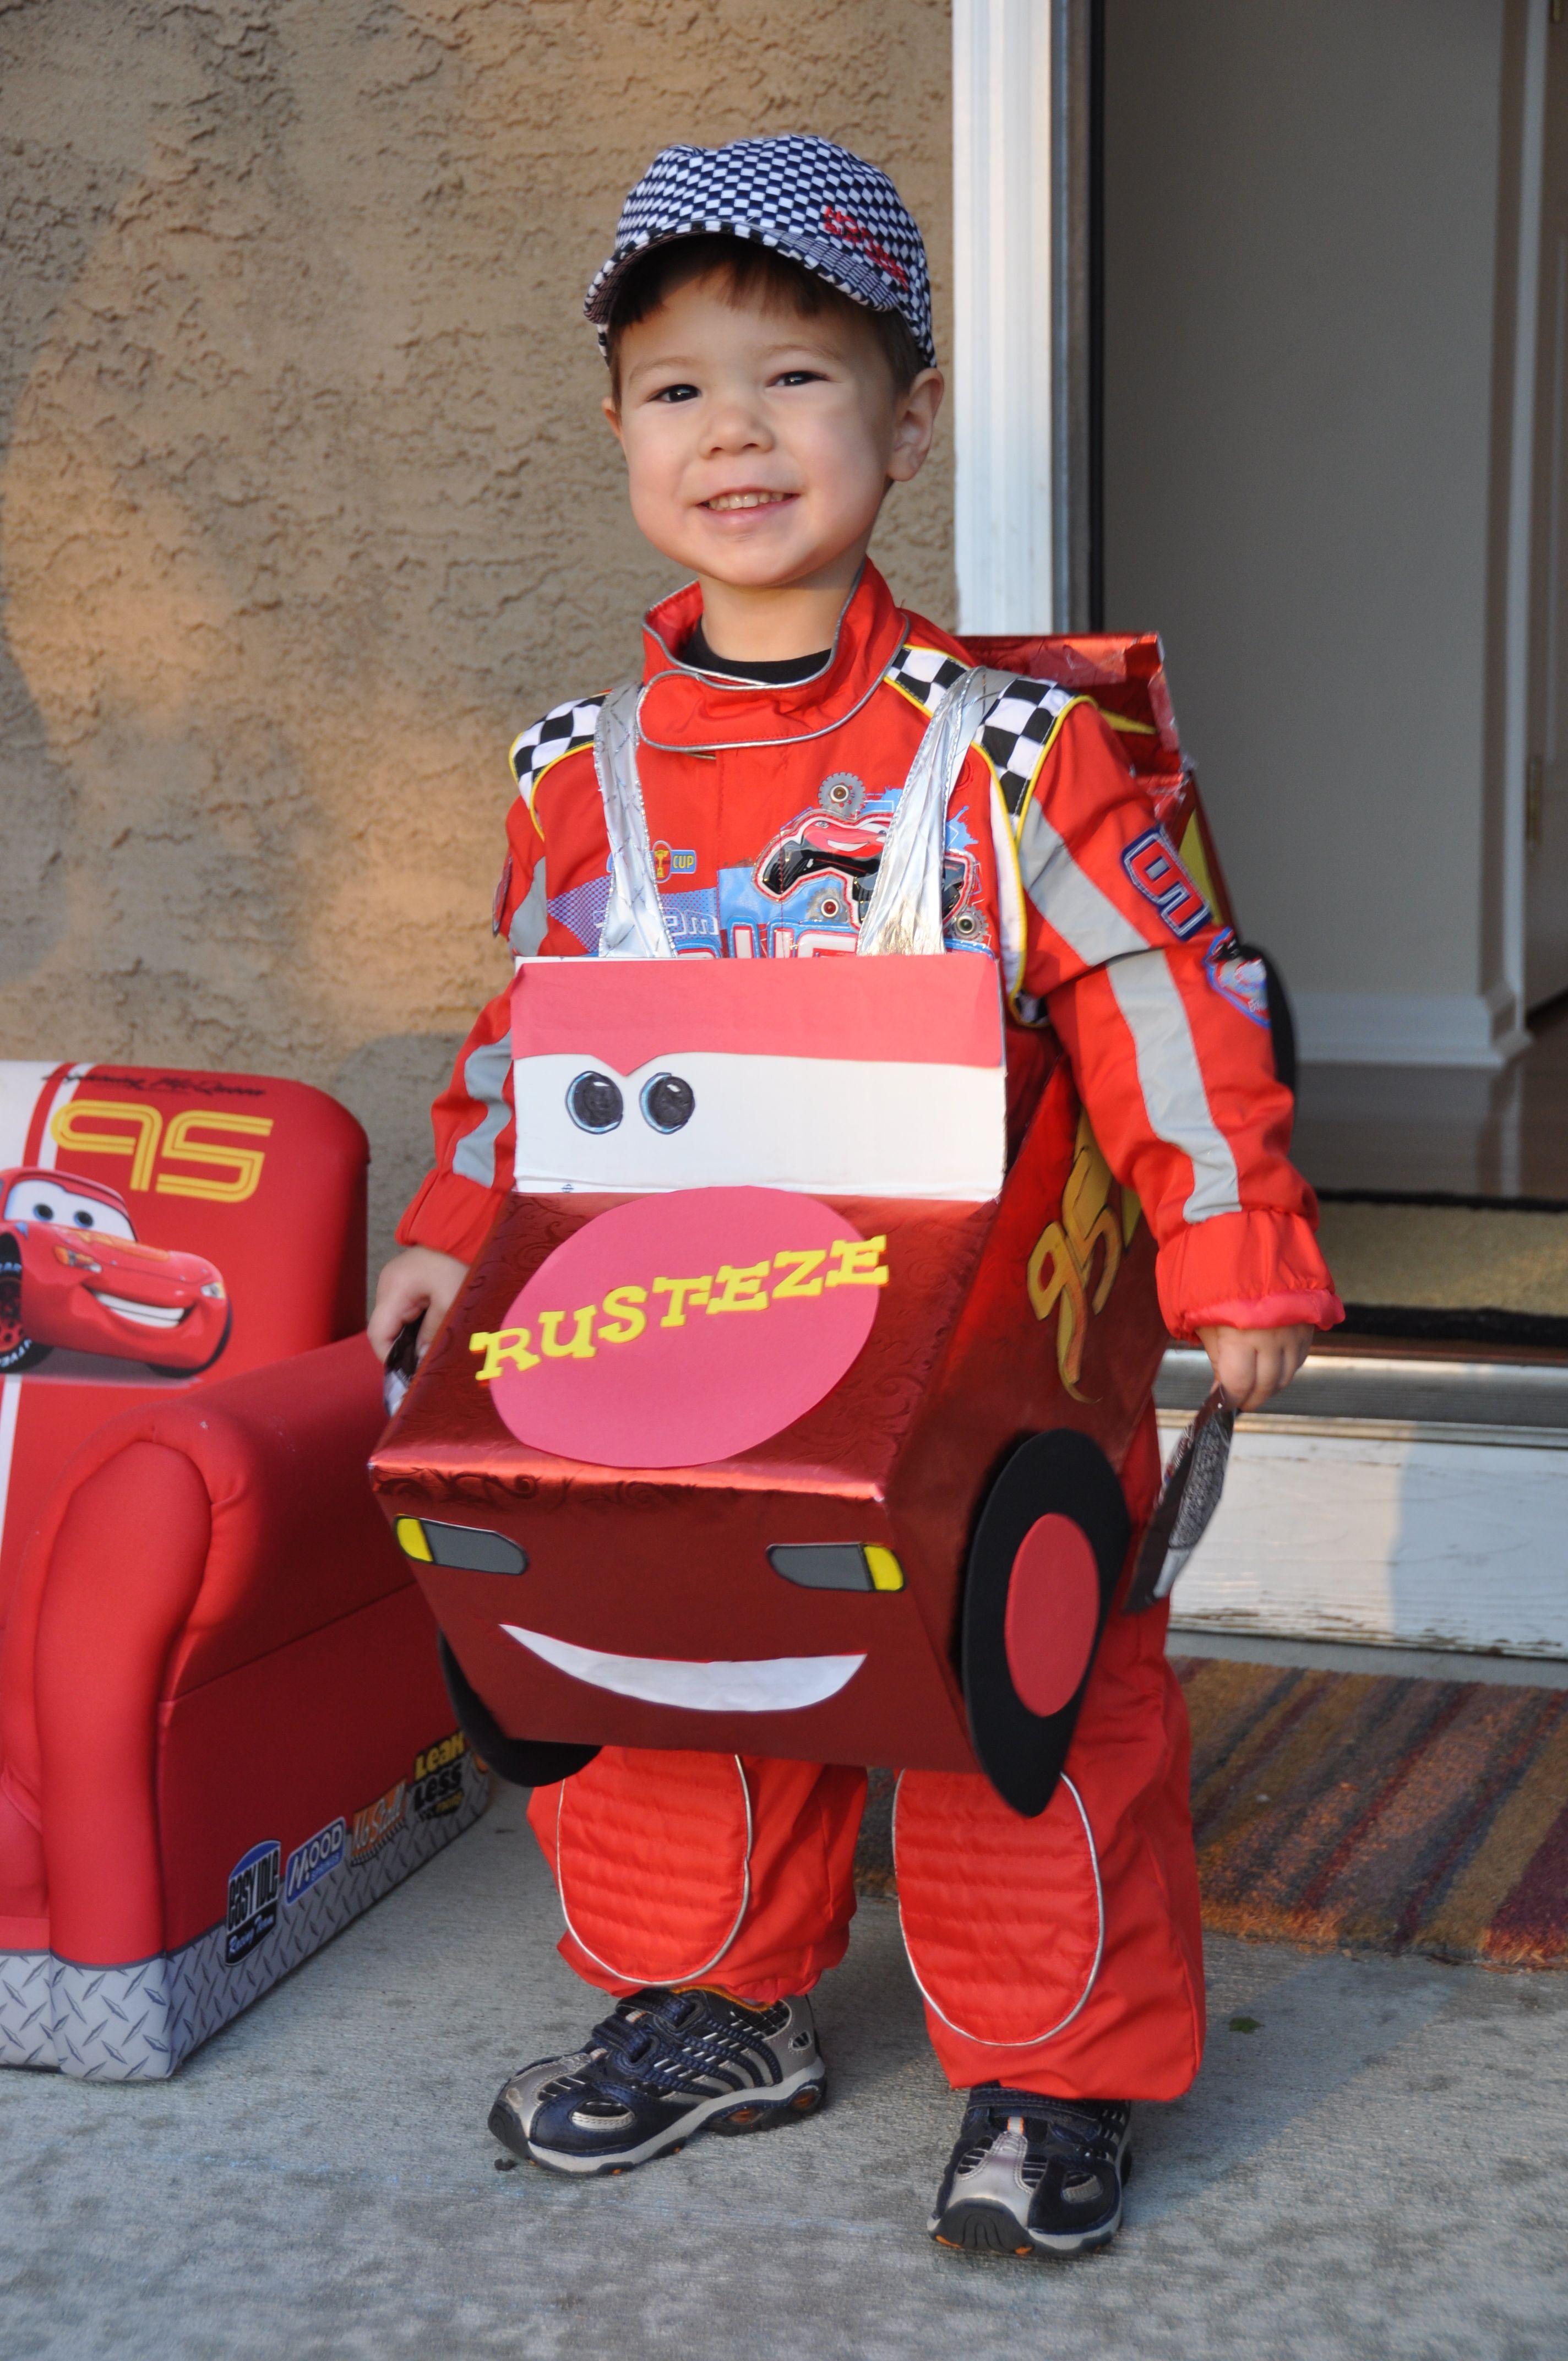 Homemade Race Car Costume Race car costume, Car costume